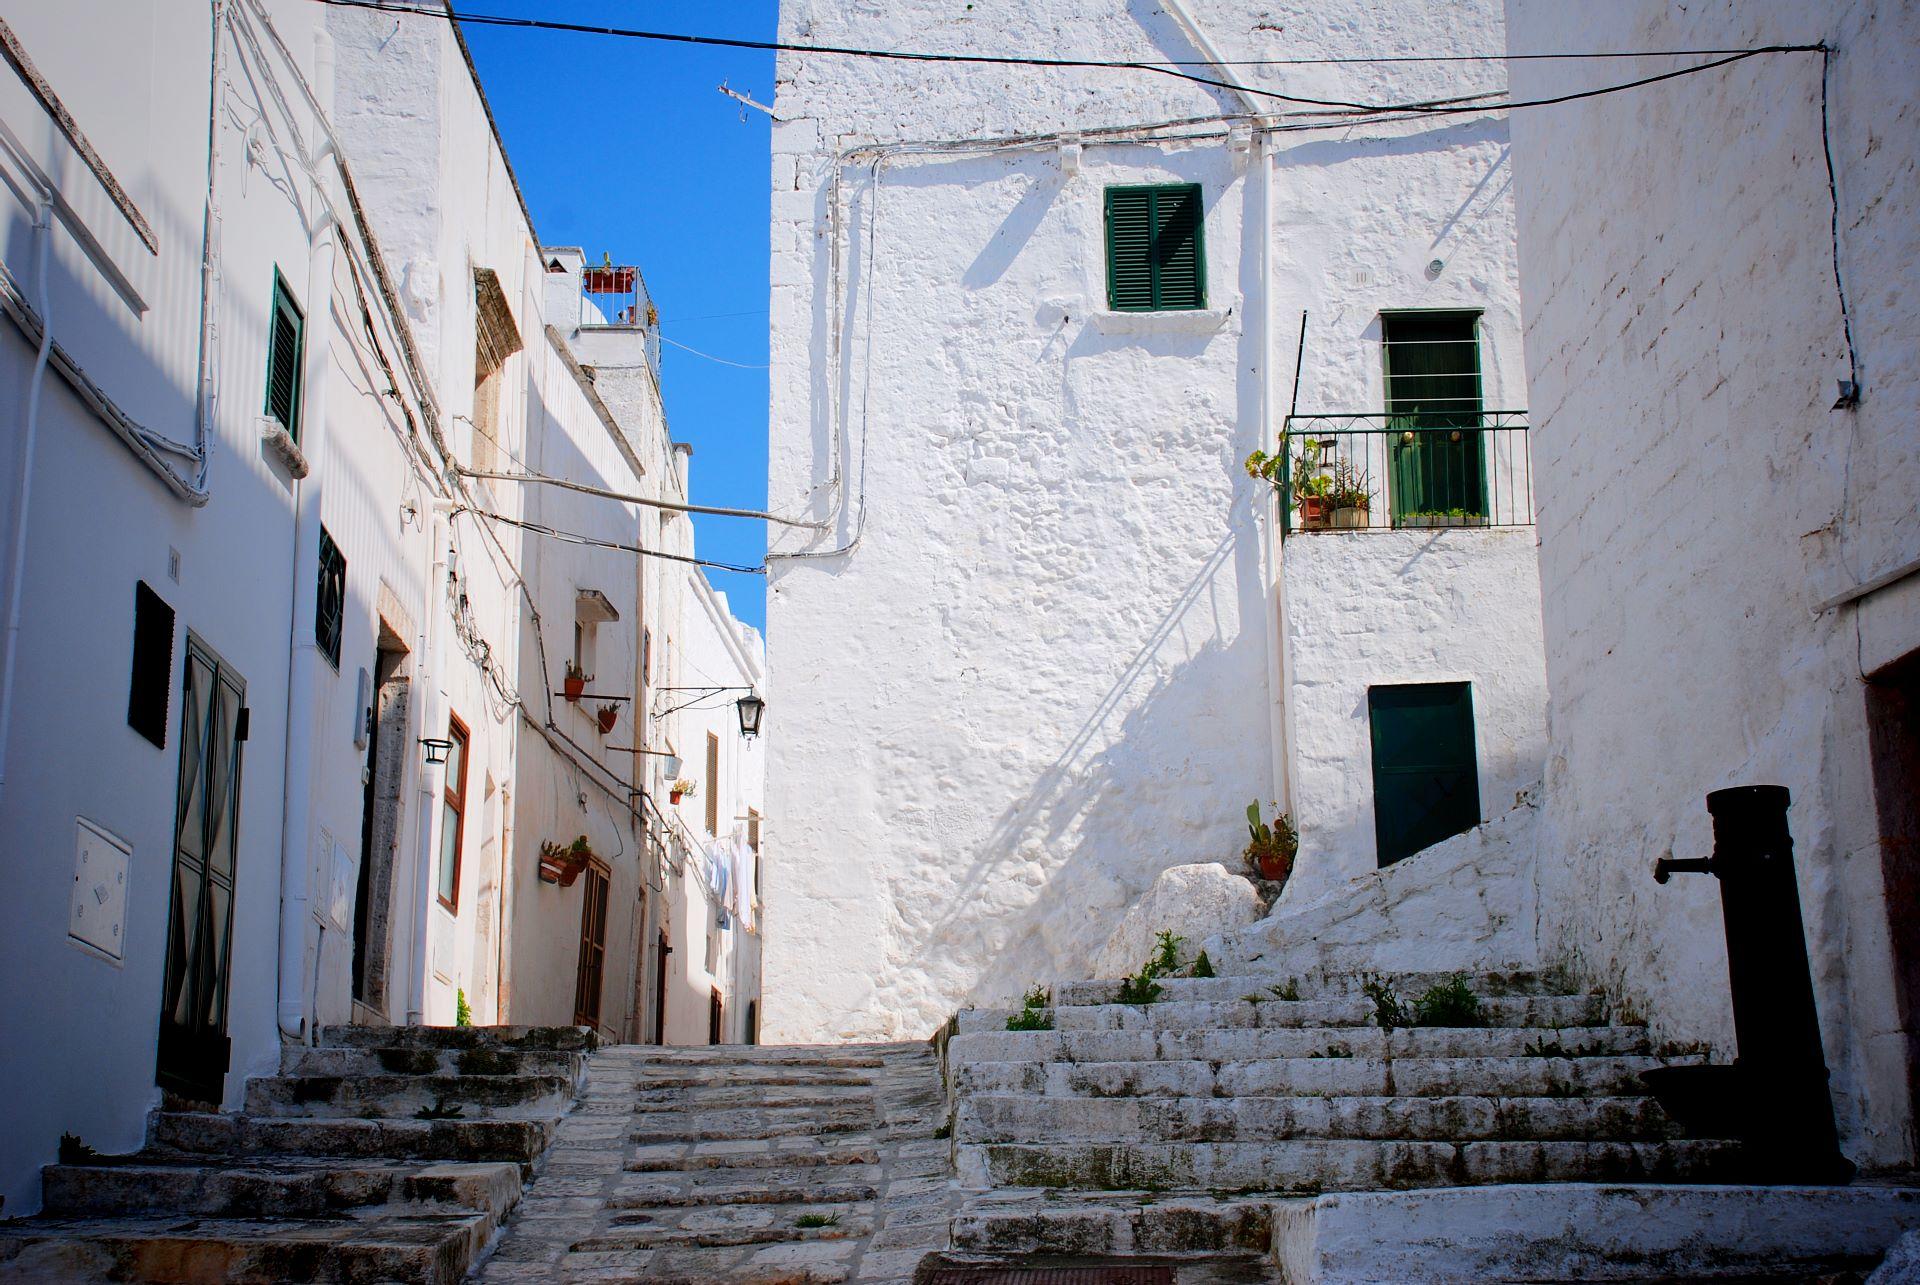 apulia-slow-travel-ostuni-gasse-vicolo-alley-scale-treppen-stiege-white-white city-die weiße stadt-citta bianca-stairs-medioevo-mittelalter-valle-d'itria